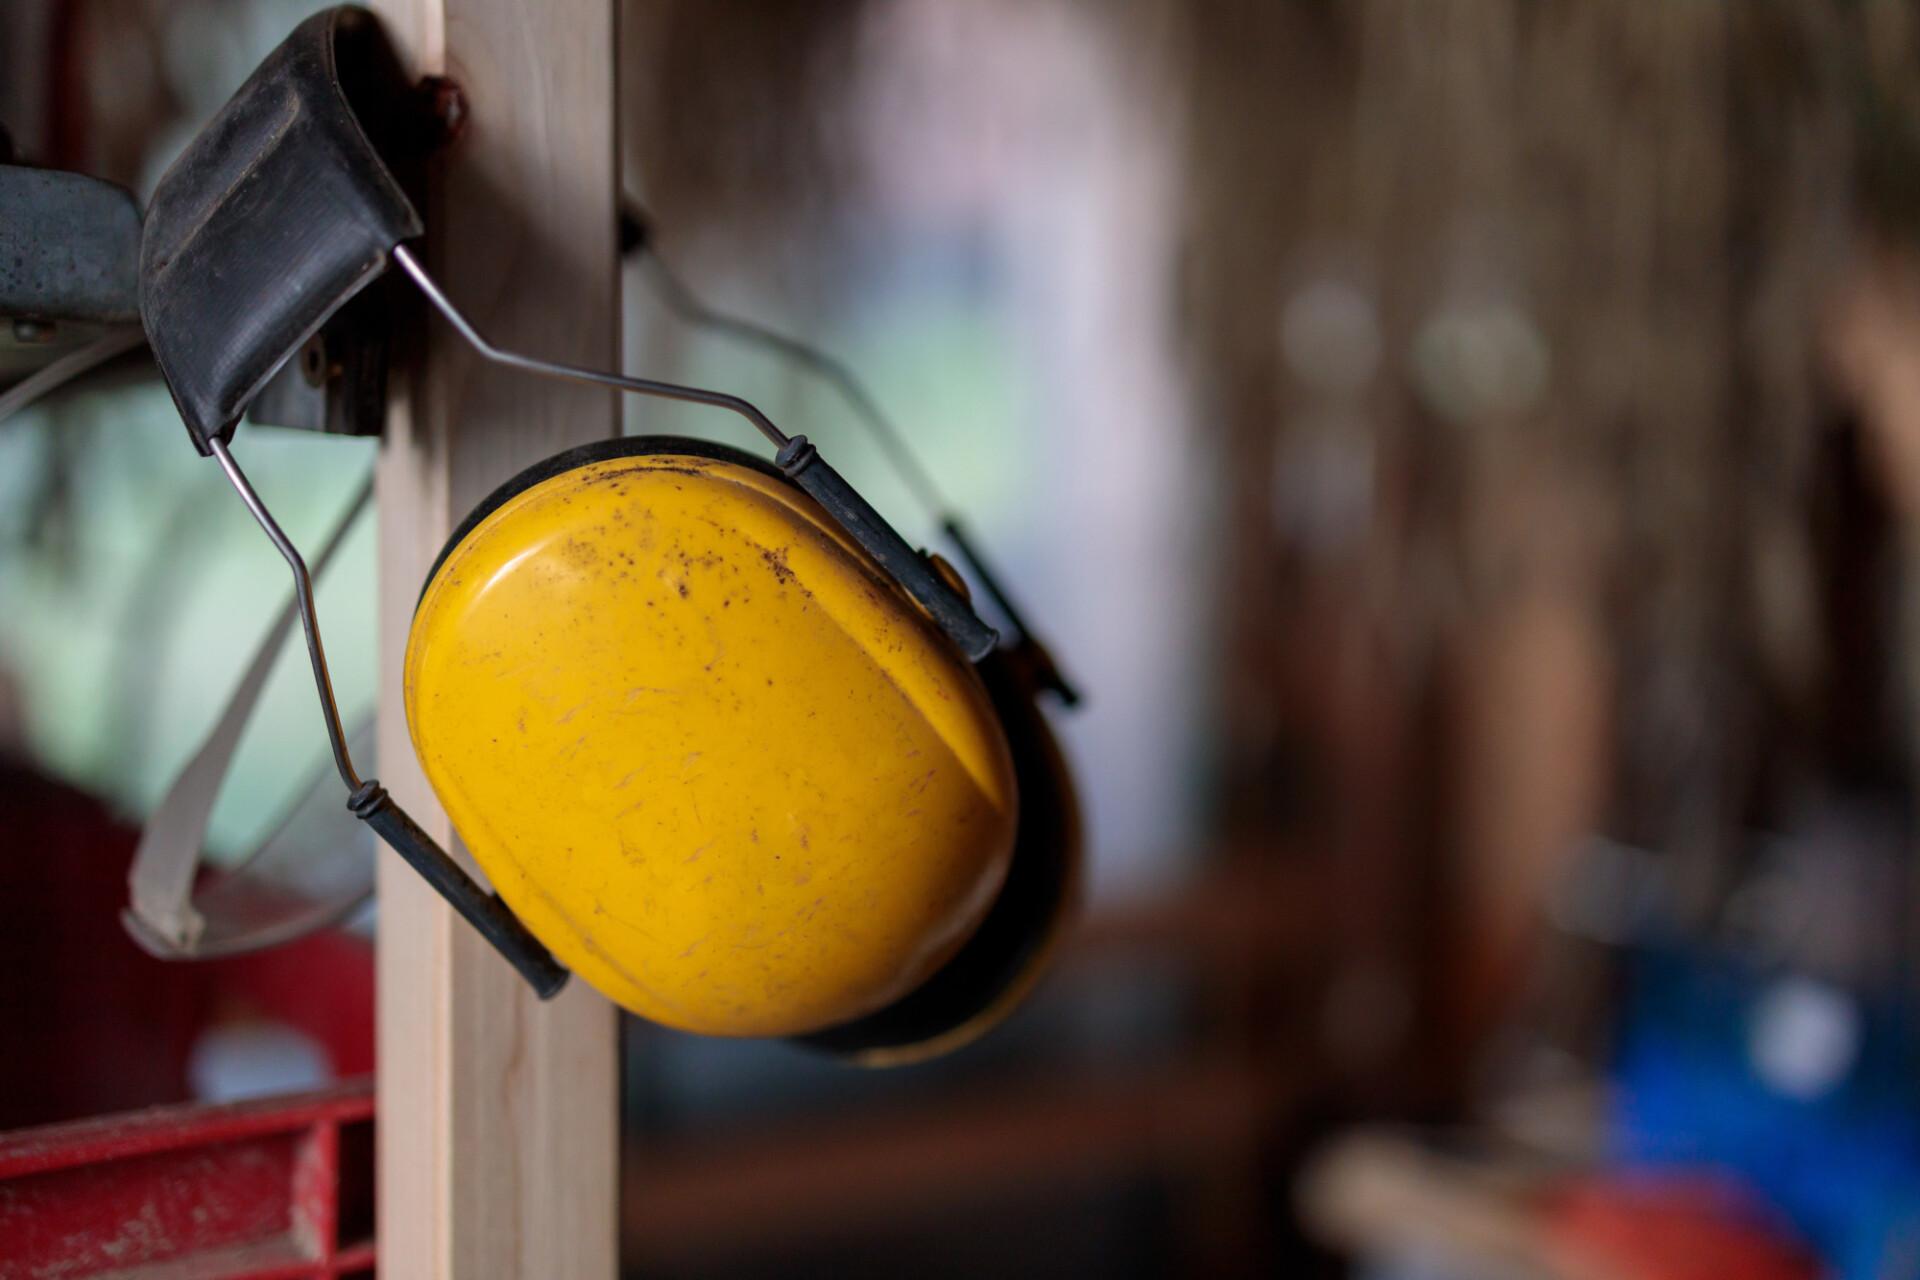 Yellow ear protection headphones